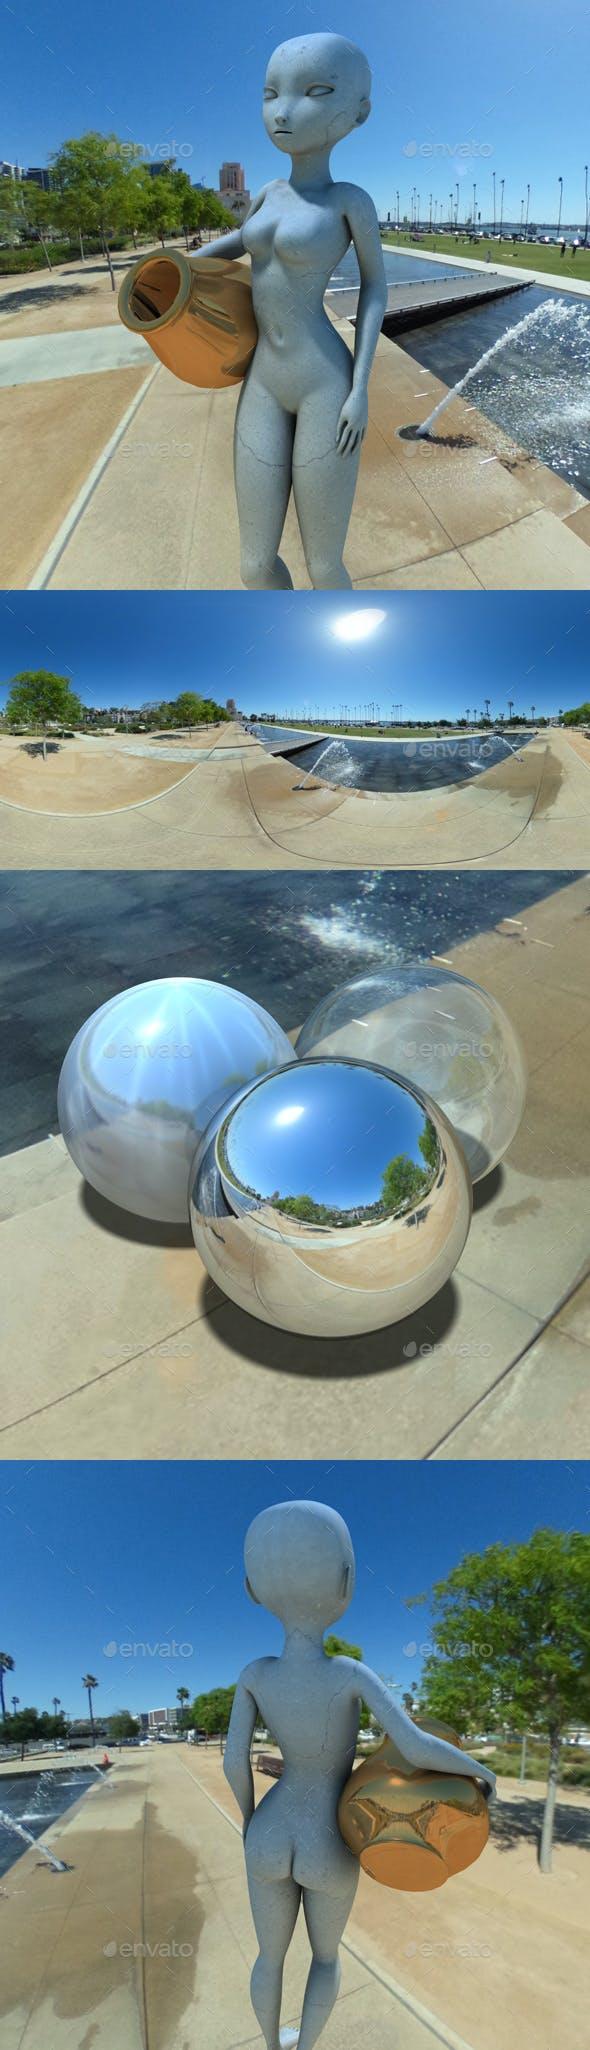 Sunny Urban Water Fountain HDRI - 3DOcean Item for Sale